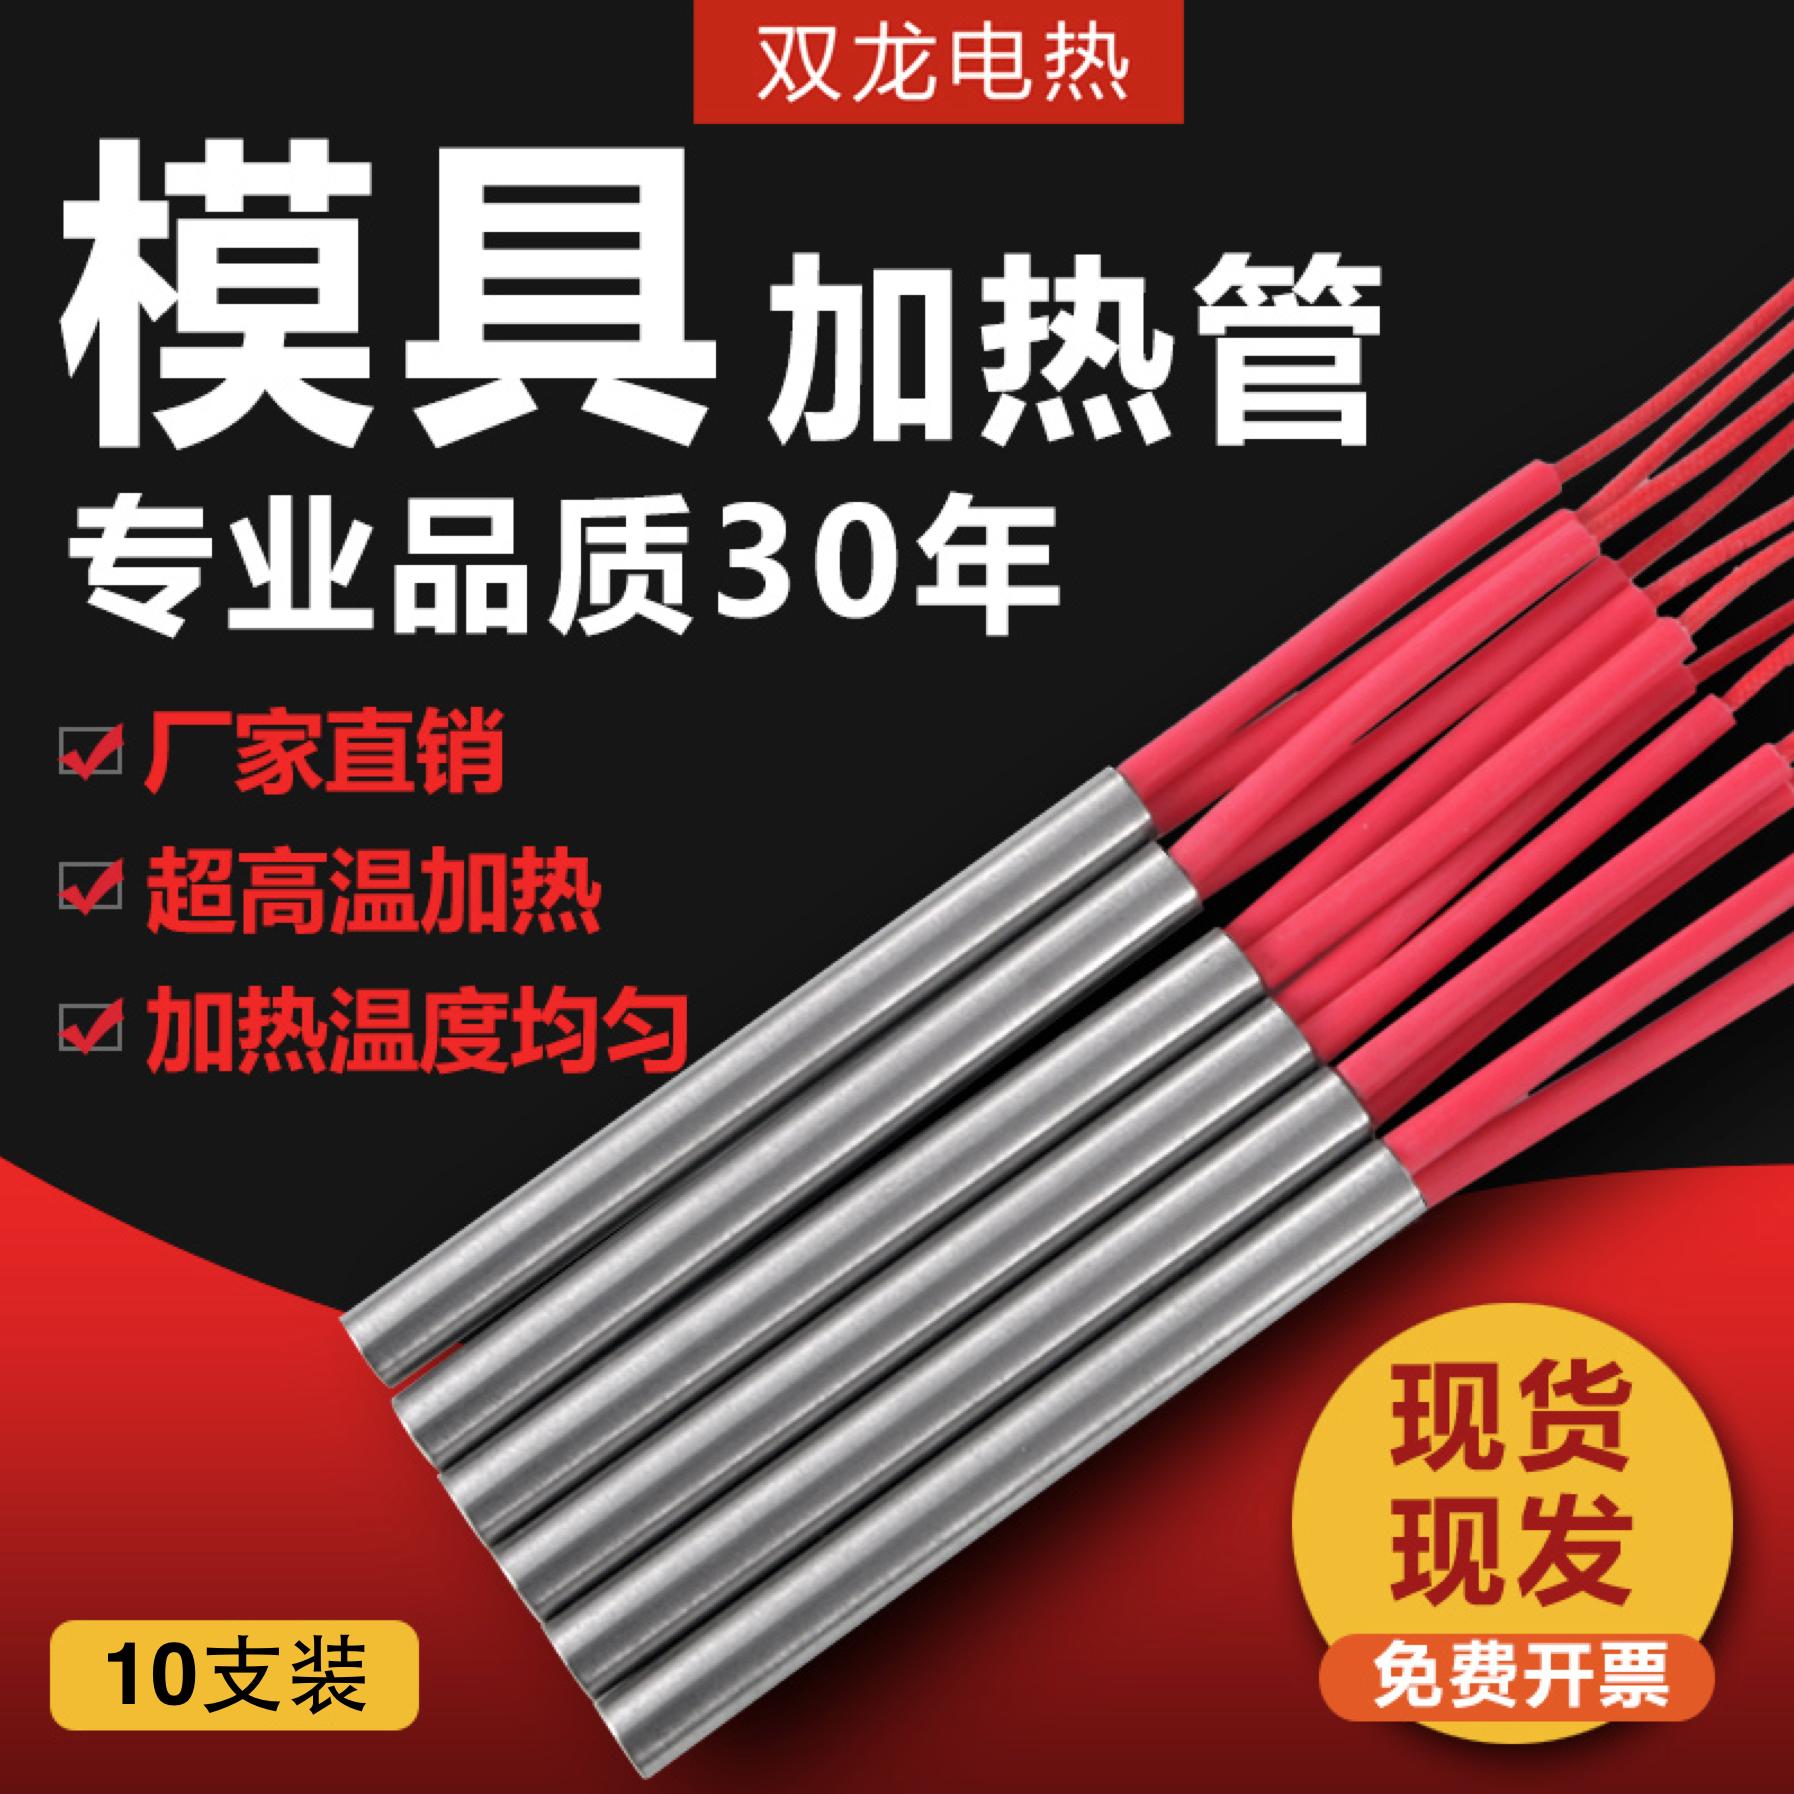 Kai single head mold electric heating tube 220v380v dry burning type ultra-high temperature heating tube heating rod 10 pieces